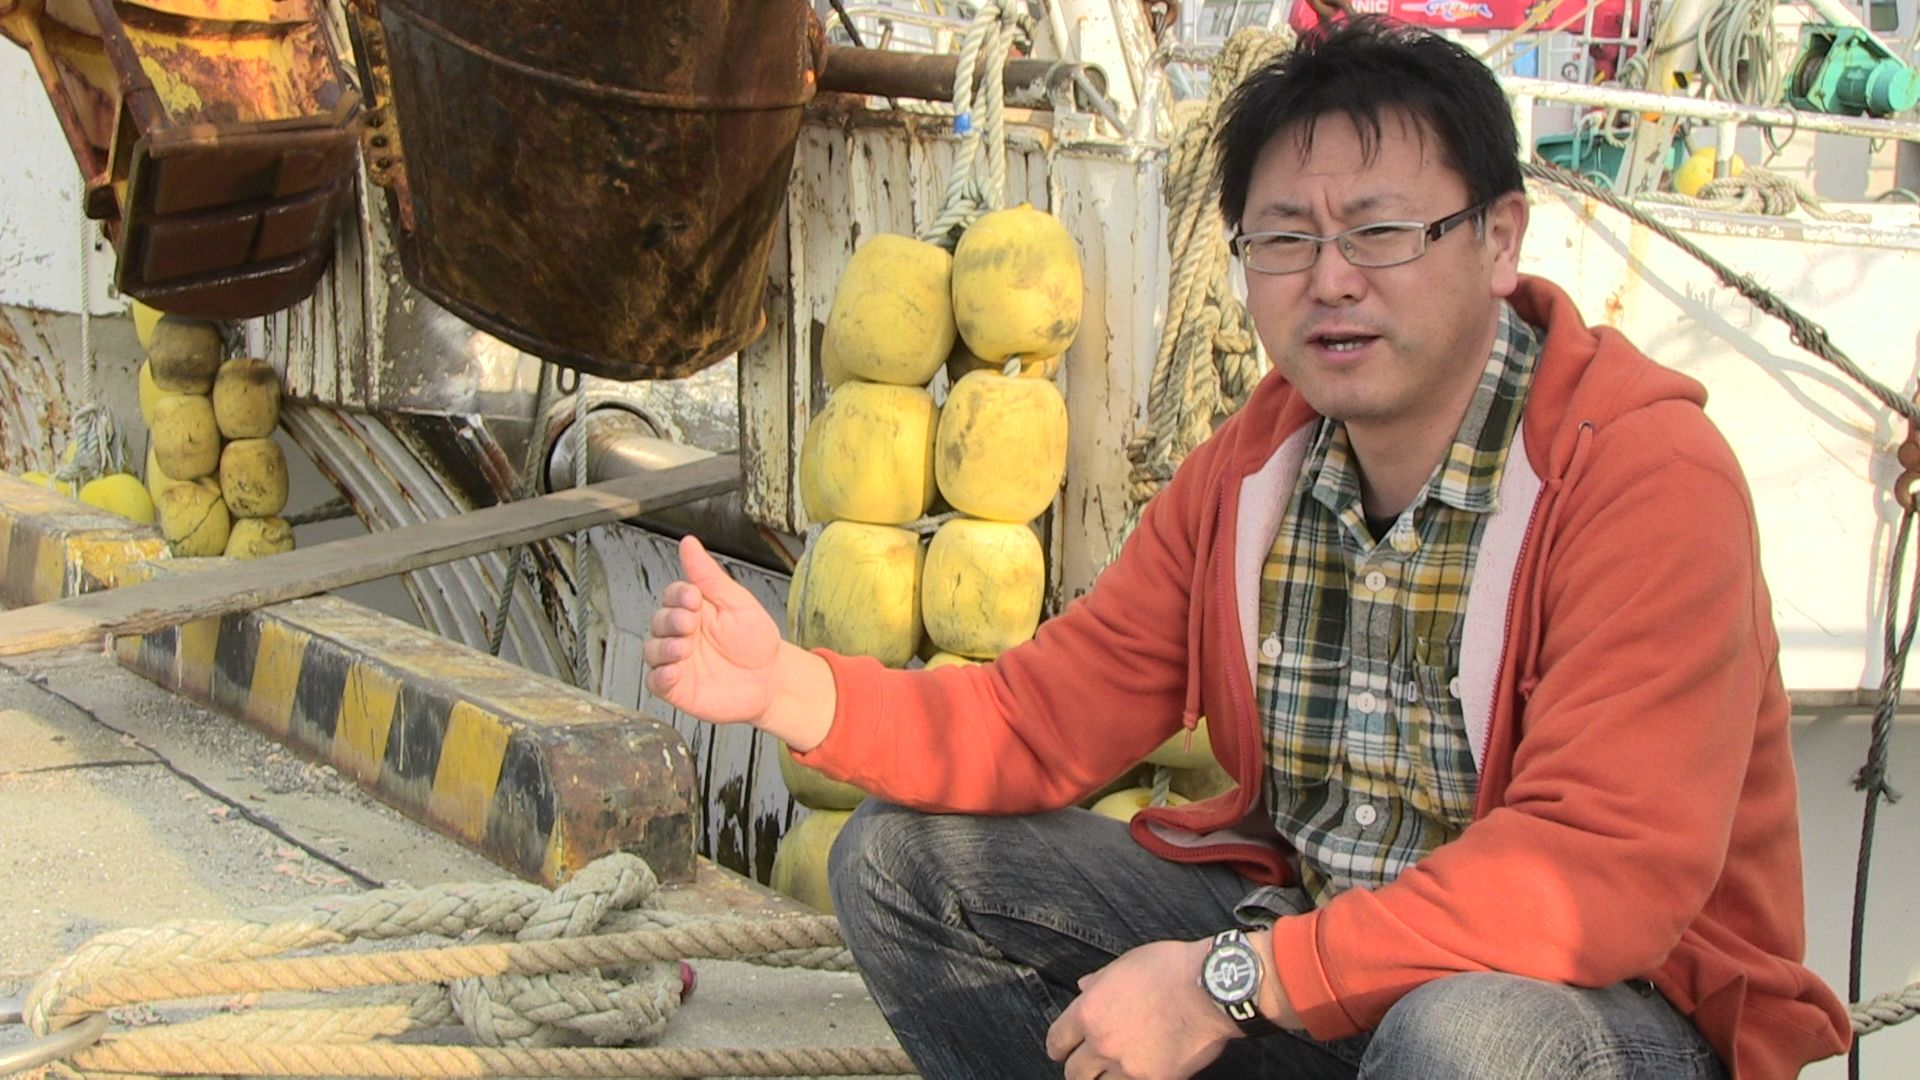 soma fisherman interview framegrab.jpg